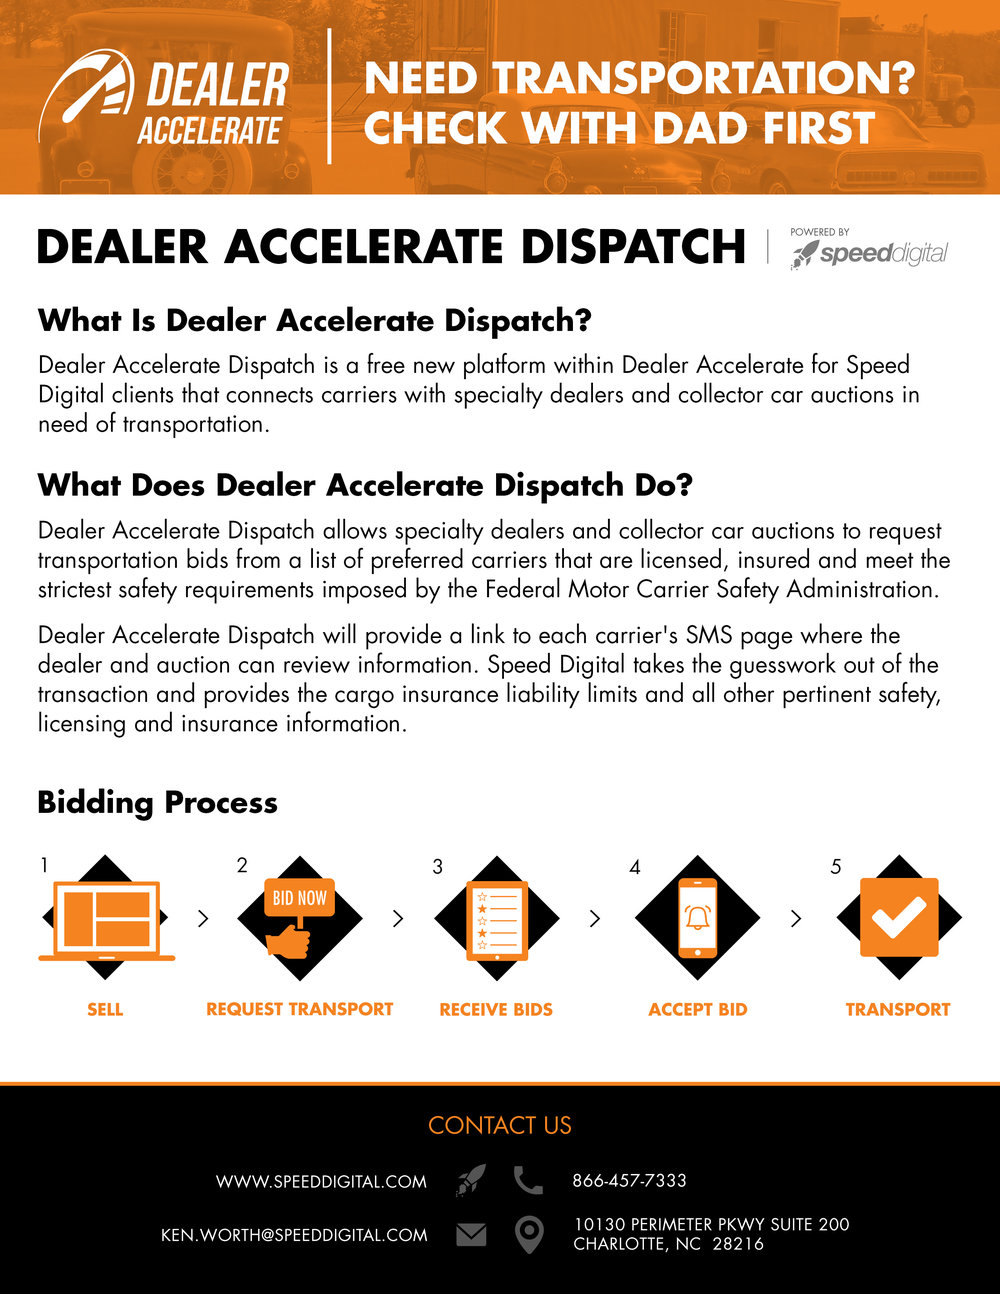 da-dispatch-flyer.jpg